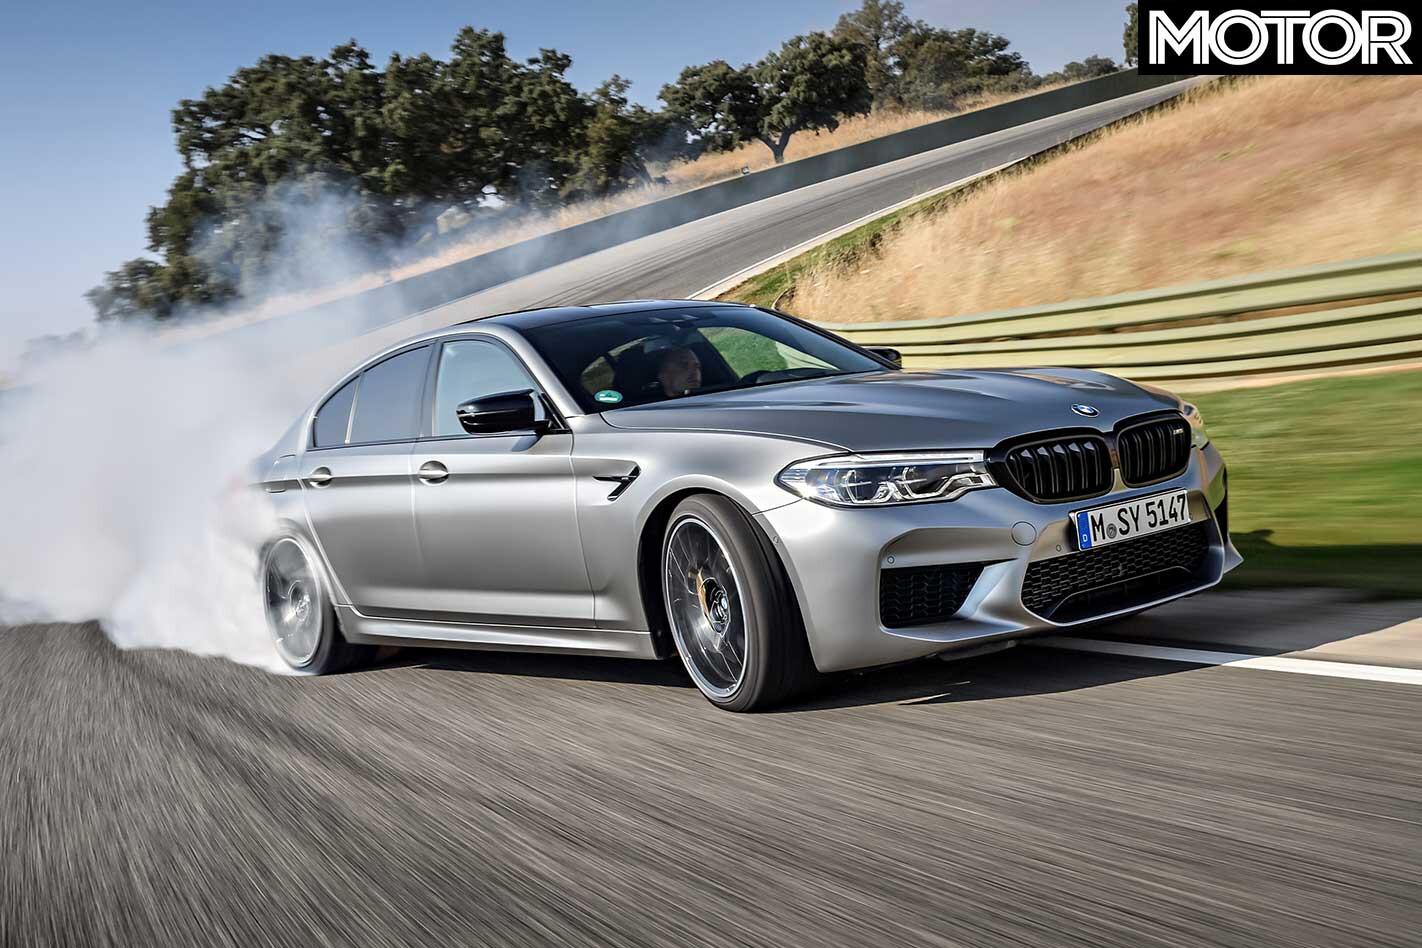 BMW M 5 Competition Jpg